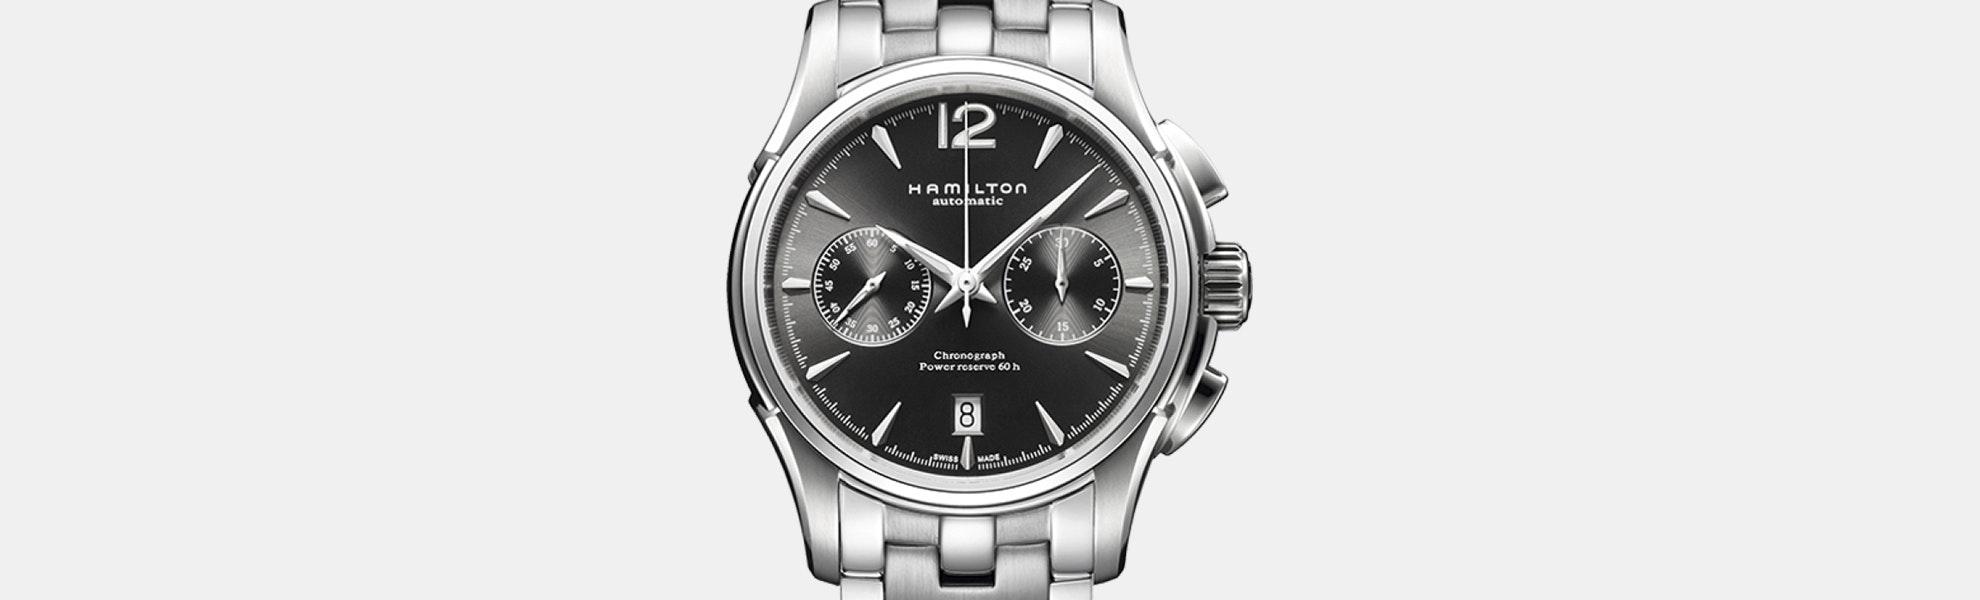 Hamilton Jazzmaster Chronograph Automatic Watch